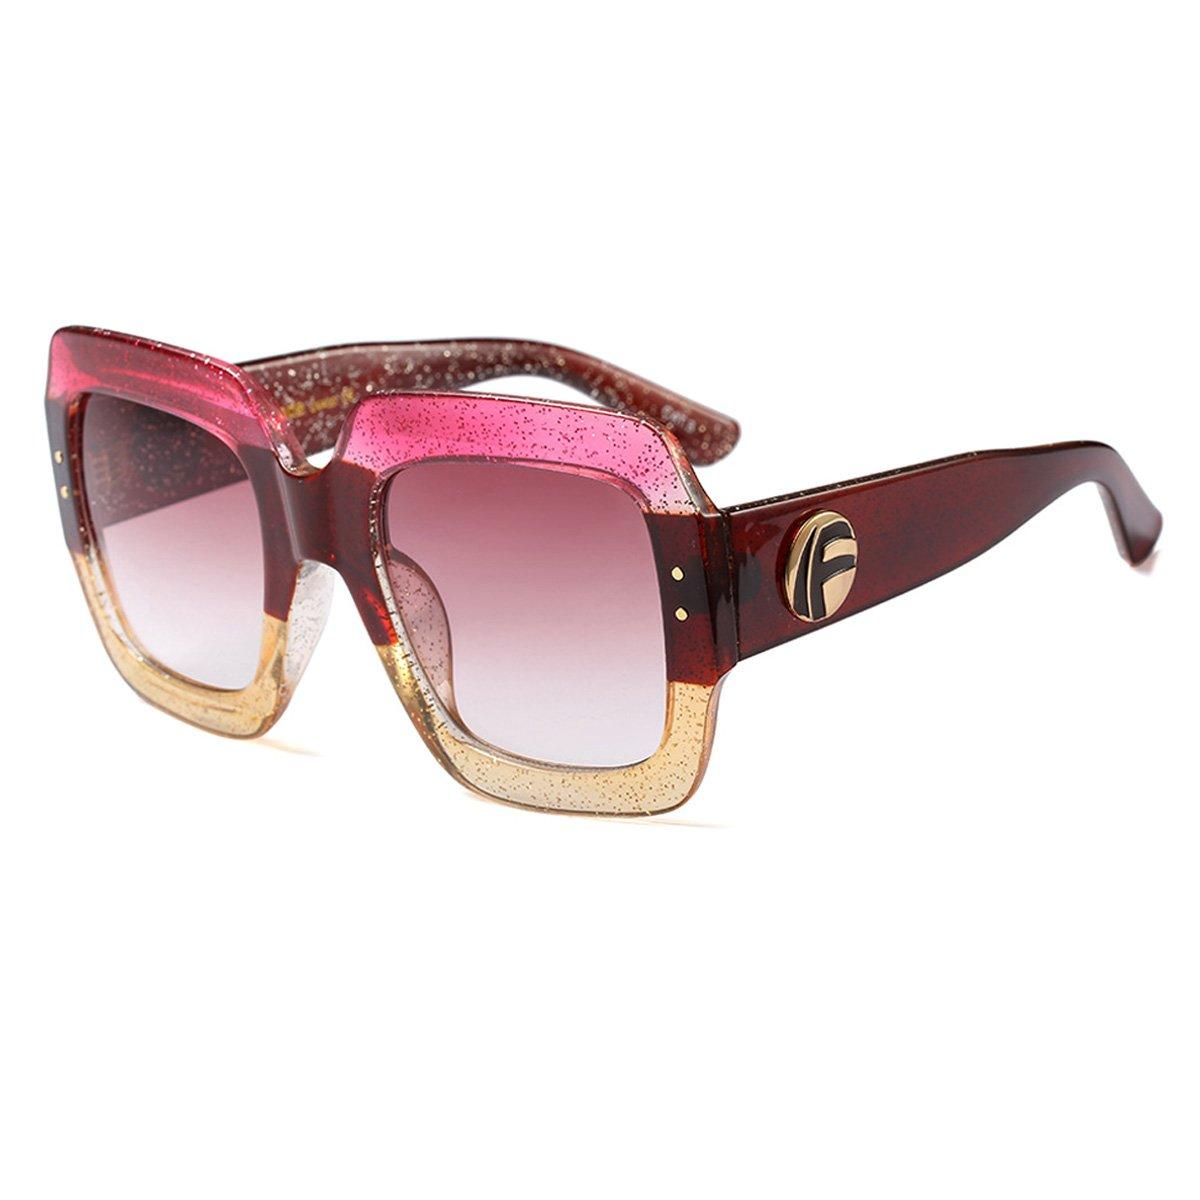 d3e5455773b2 Amazon.com  YOJBO Oversized Square Sunglasses Women UV400 Lens Big Sun Glasses  Designer Brand Luxury Vintage Retro Shade  Clothing